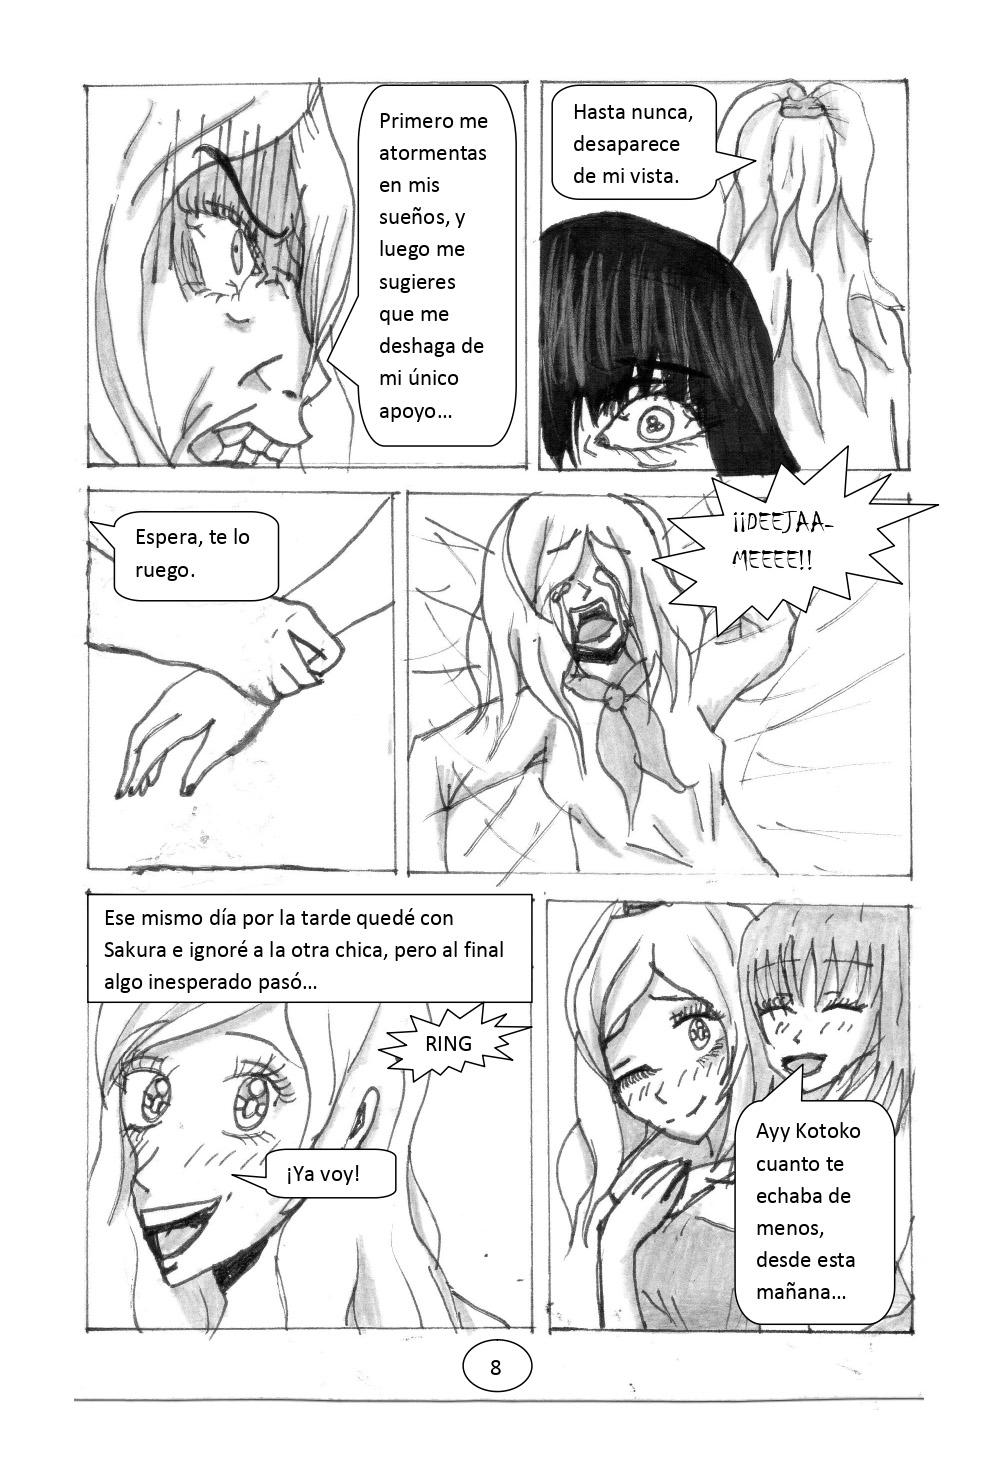 ElEngañoEncubierto_Rosario_Valenzuela_Carmona_pagina00008